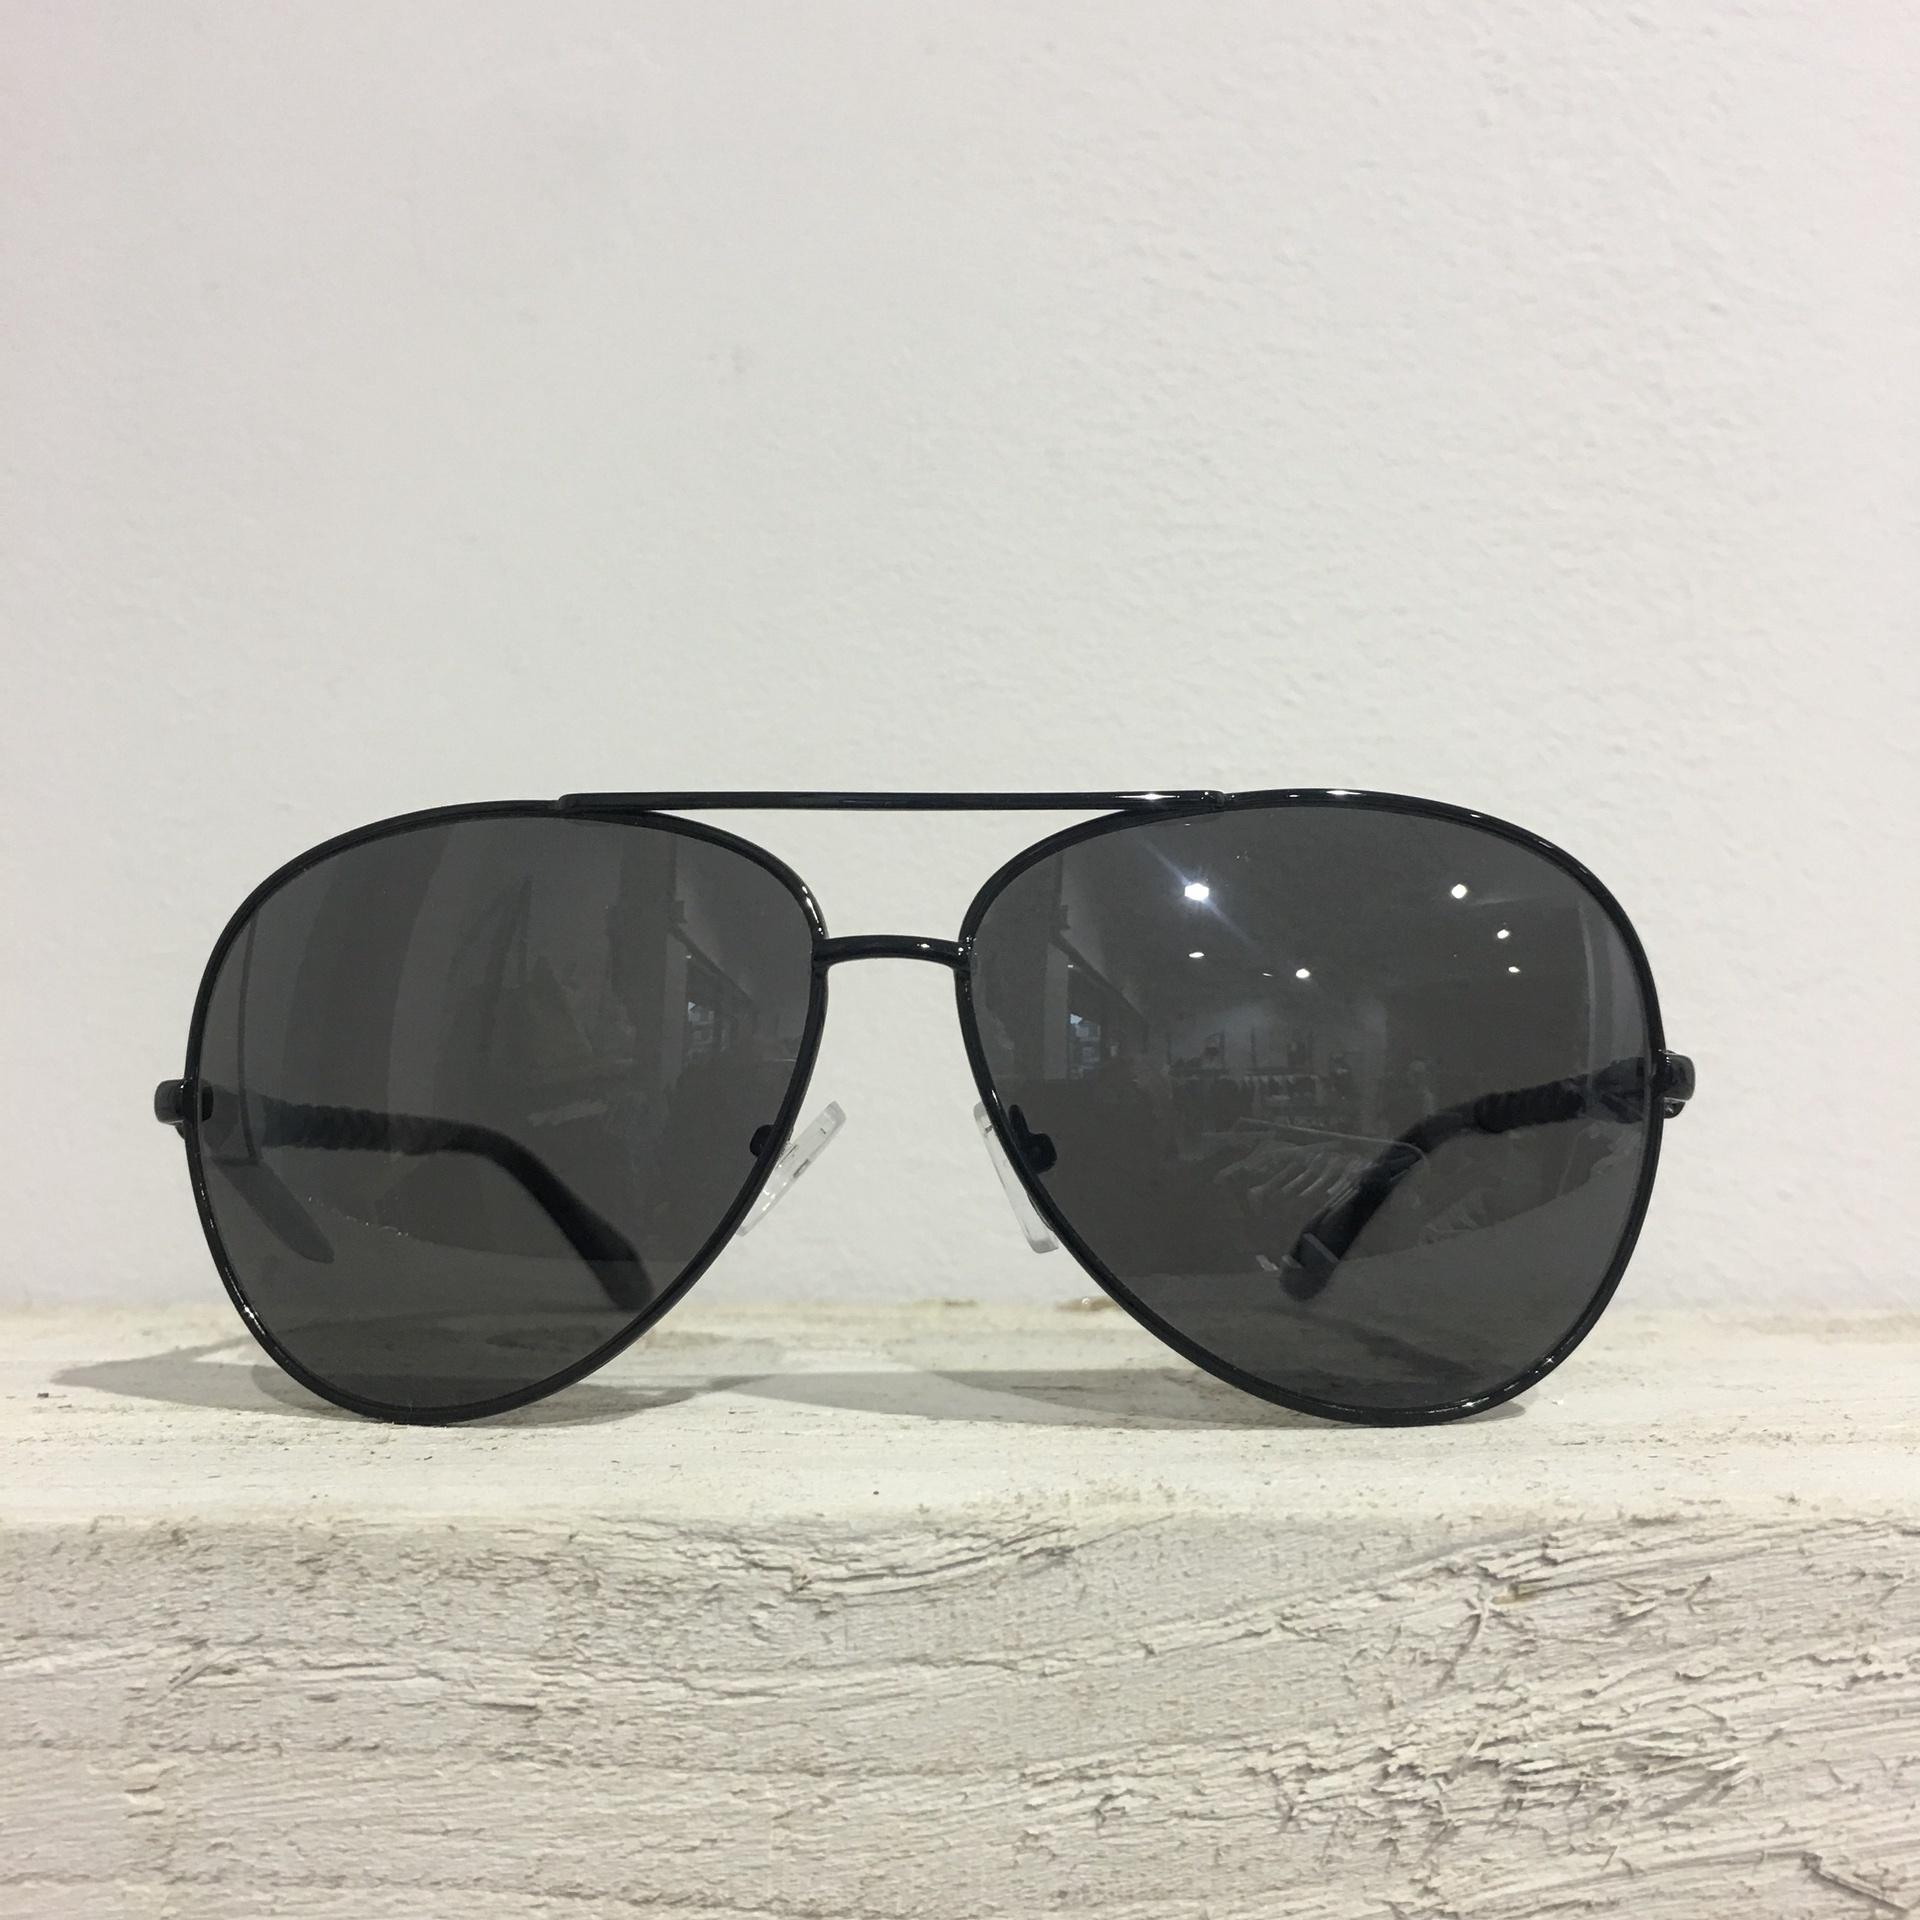 Sunglasses - Black Bar Aviator